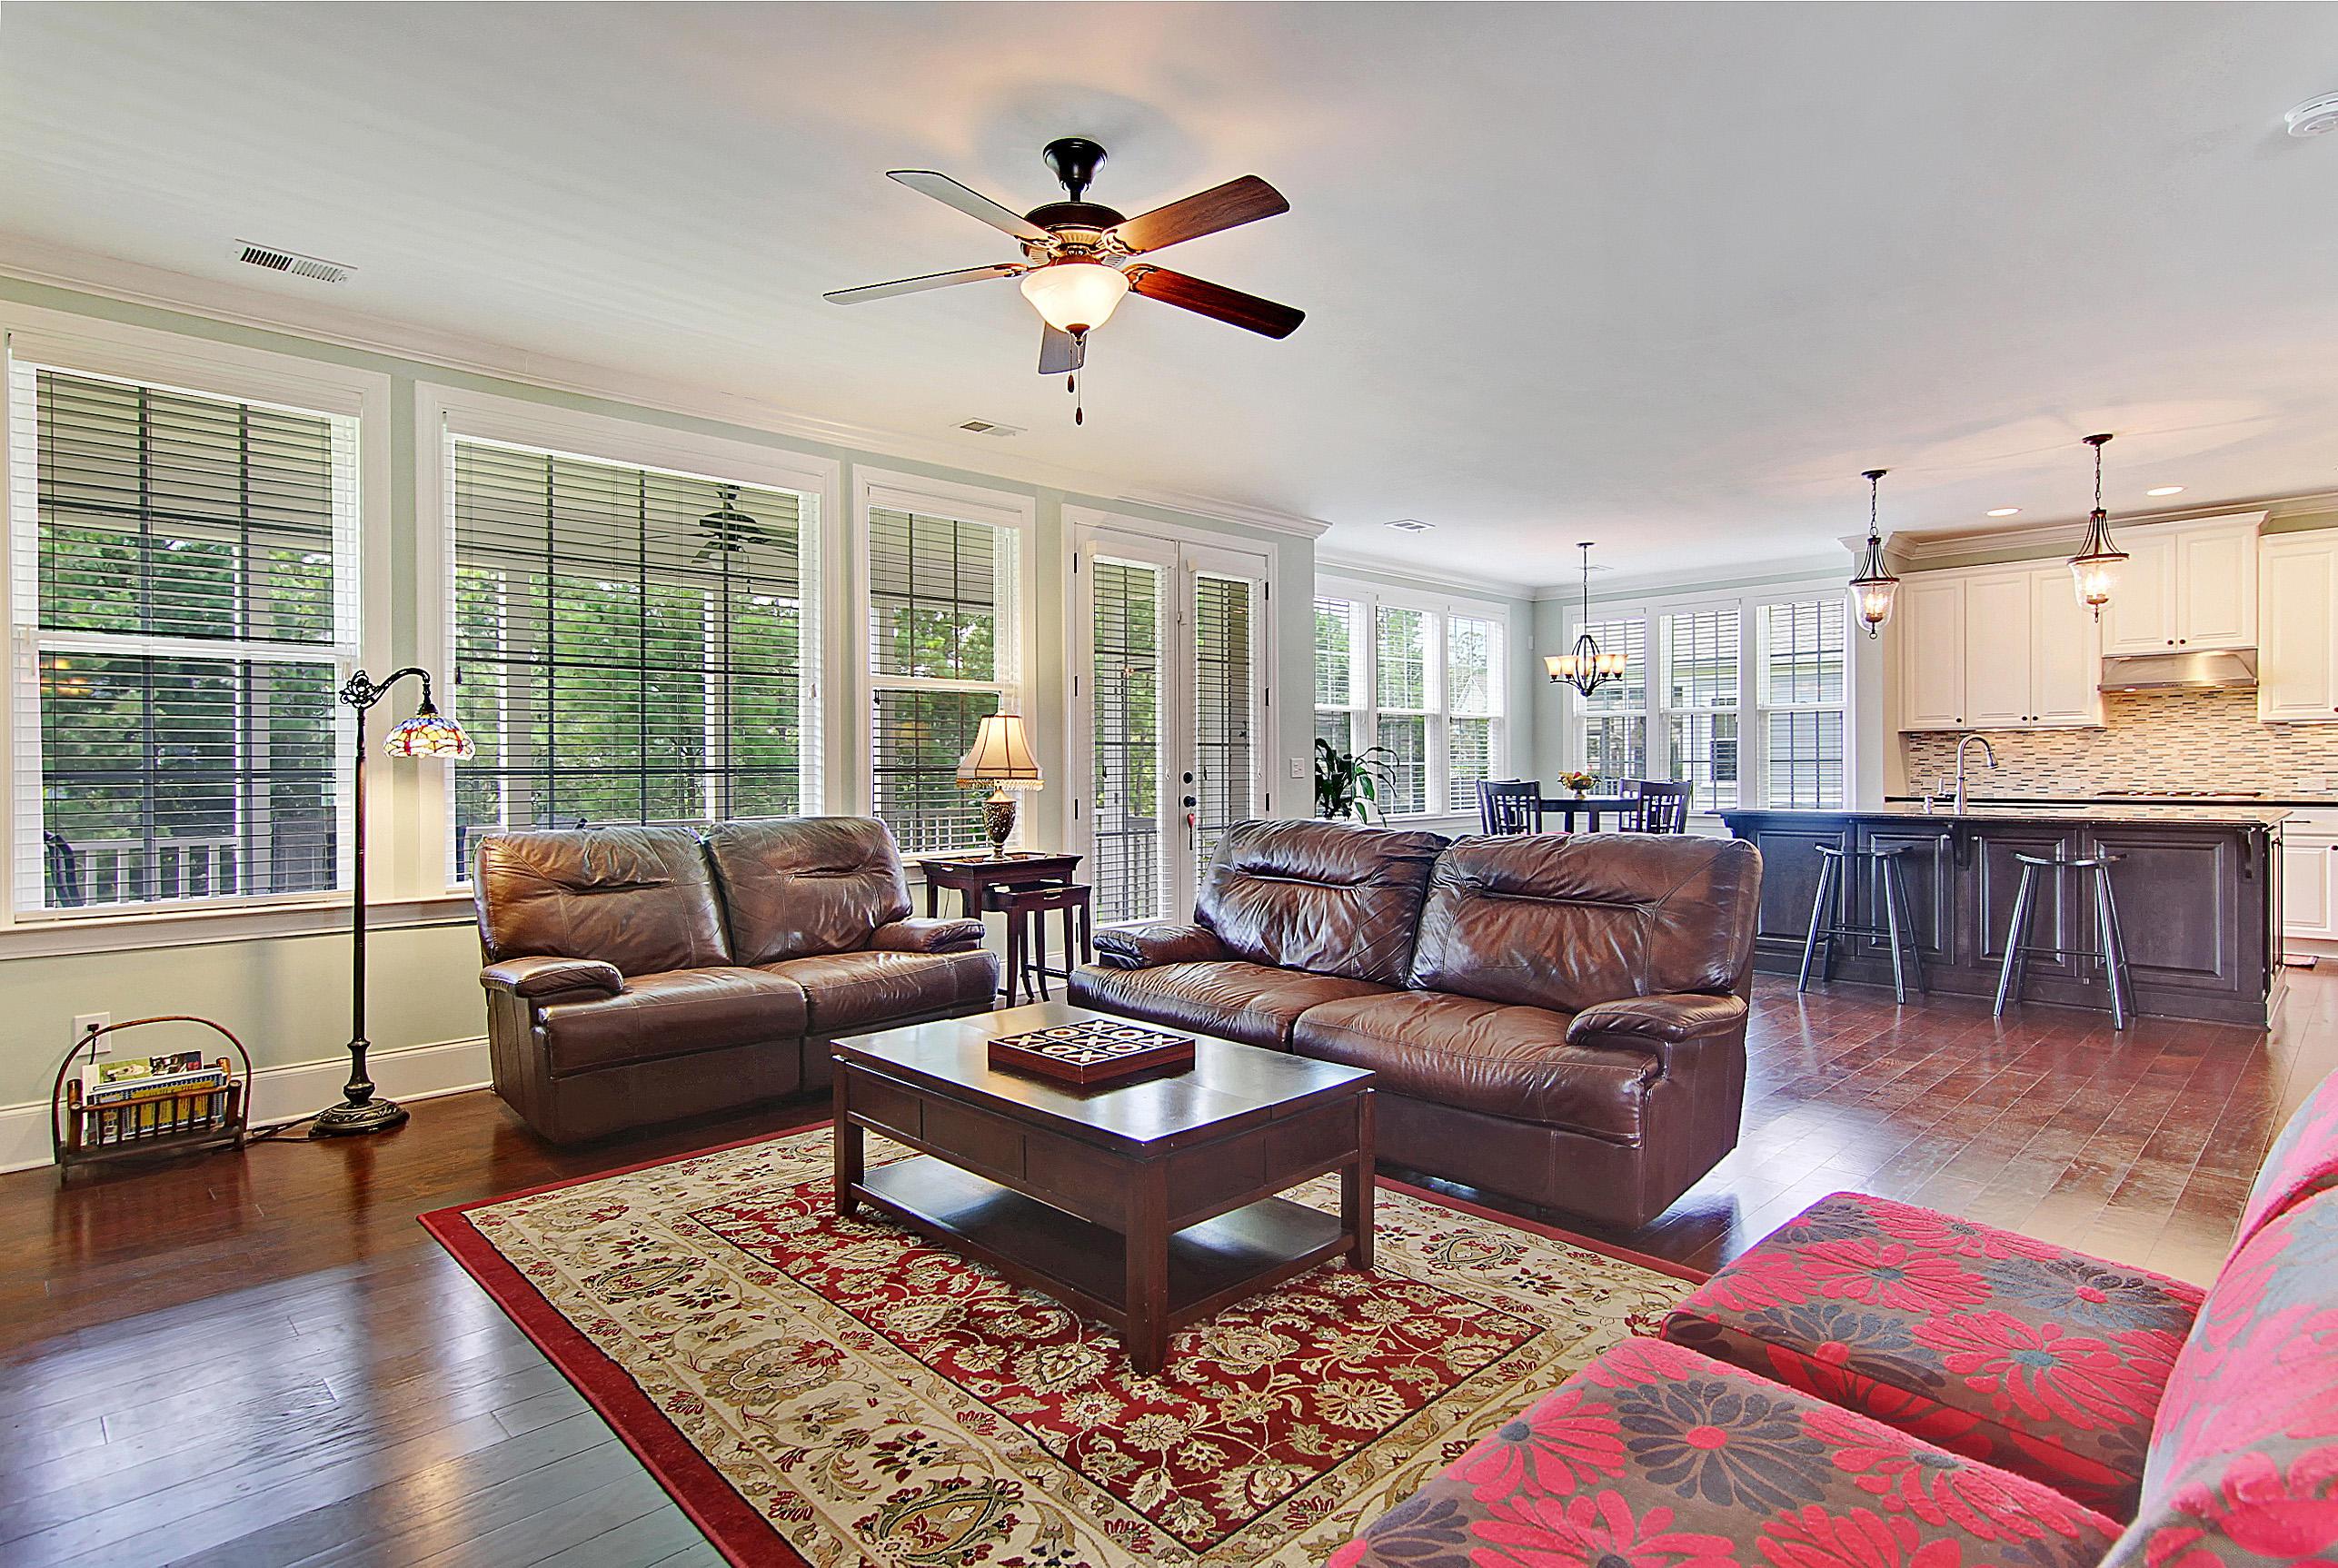 Dunes West Homes For Sale - 1332 Whisker Pole, Mount Pleasant, SC - 13